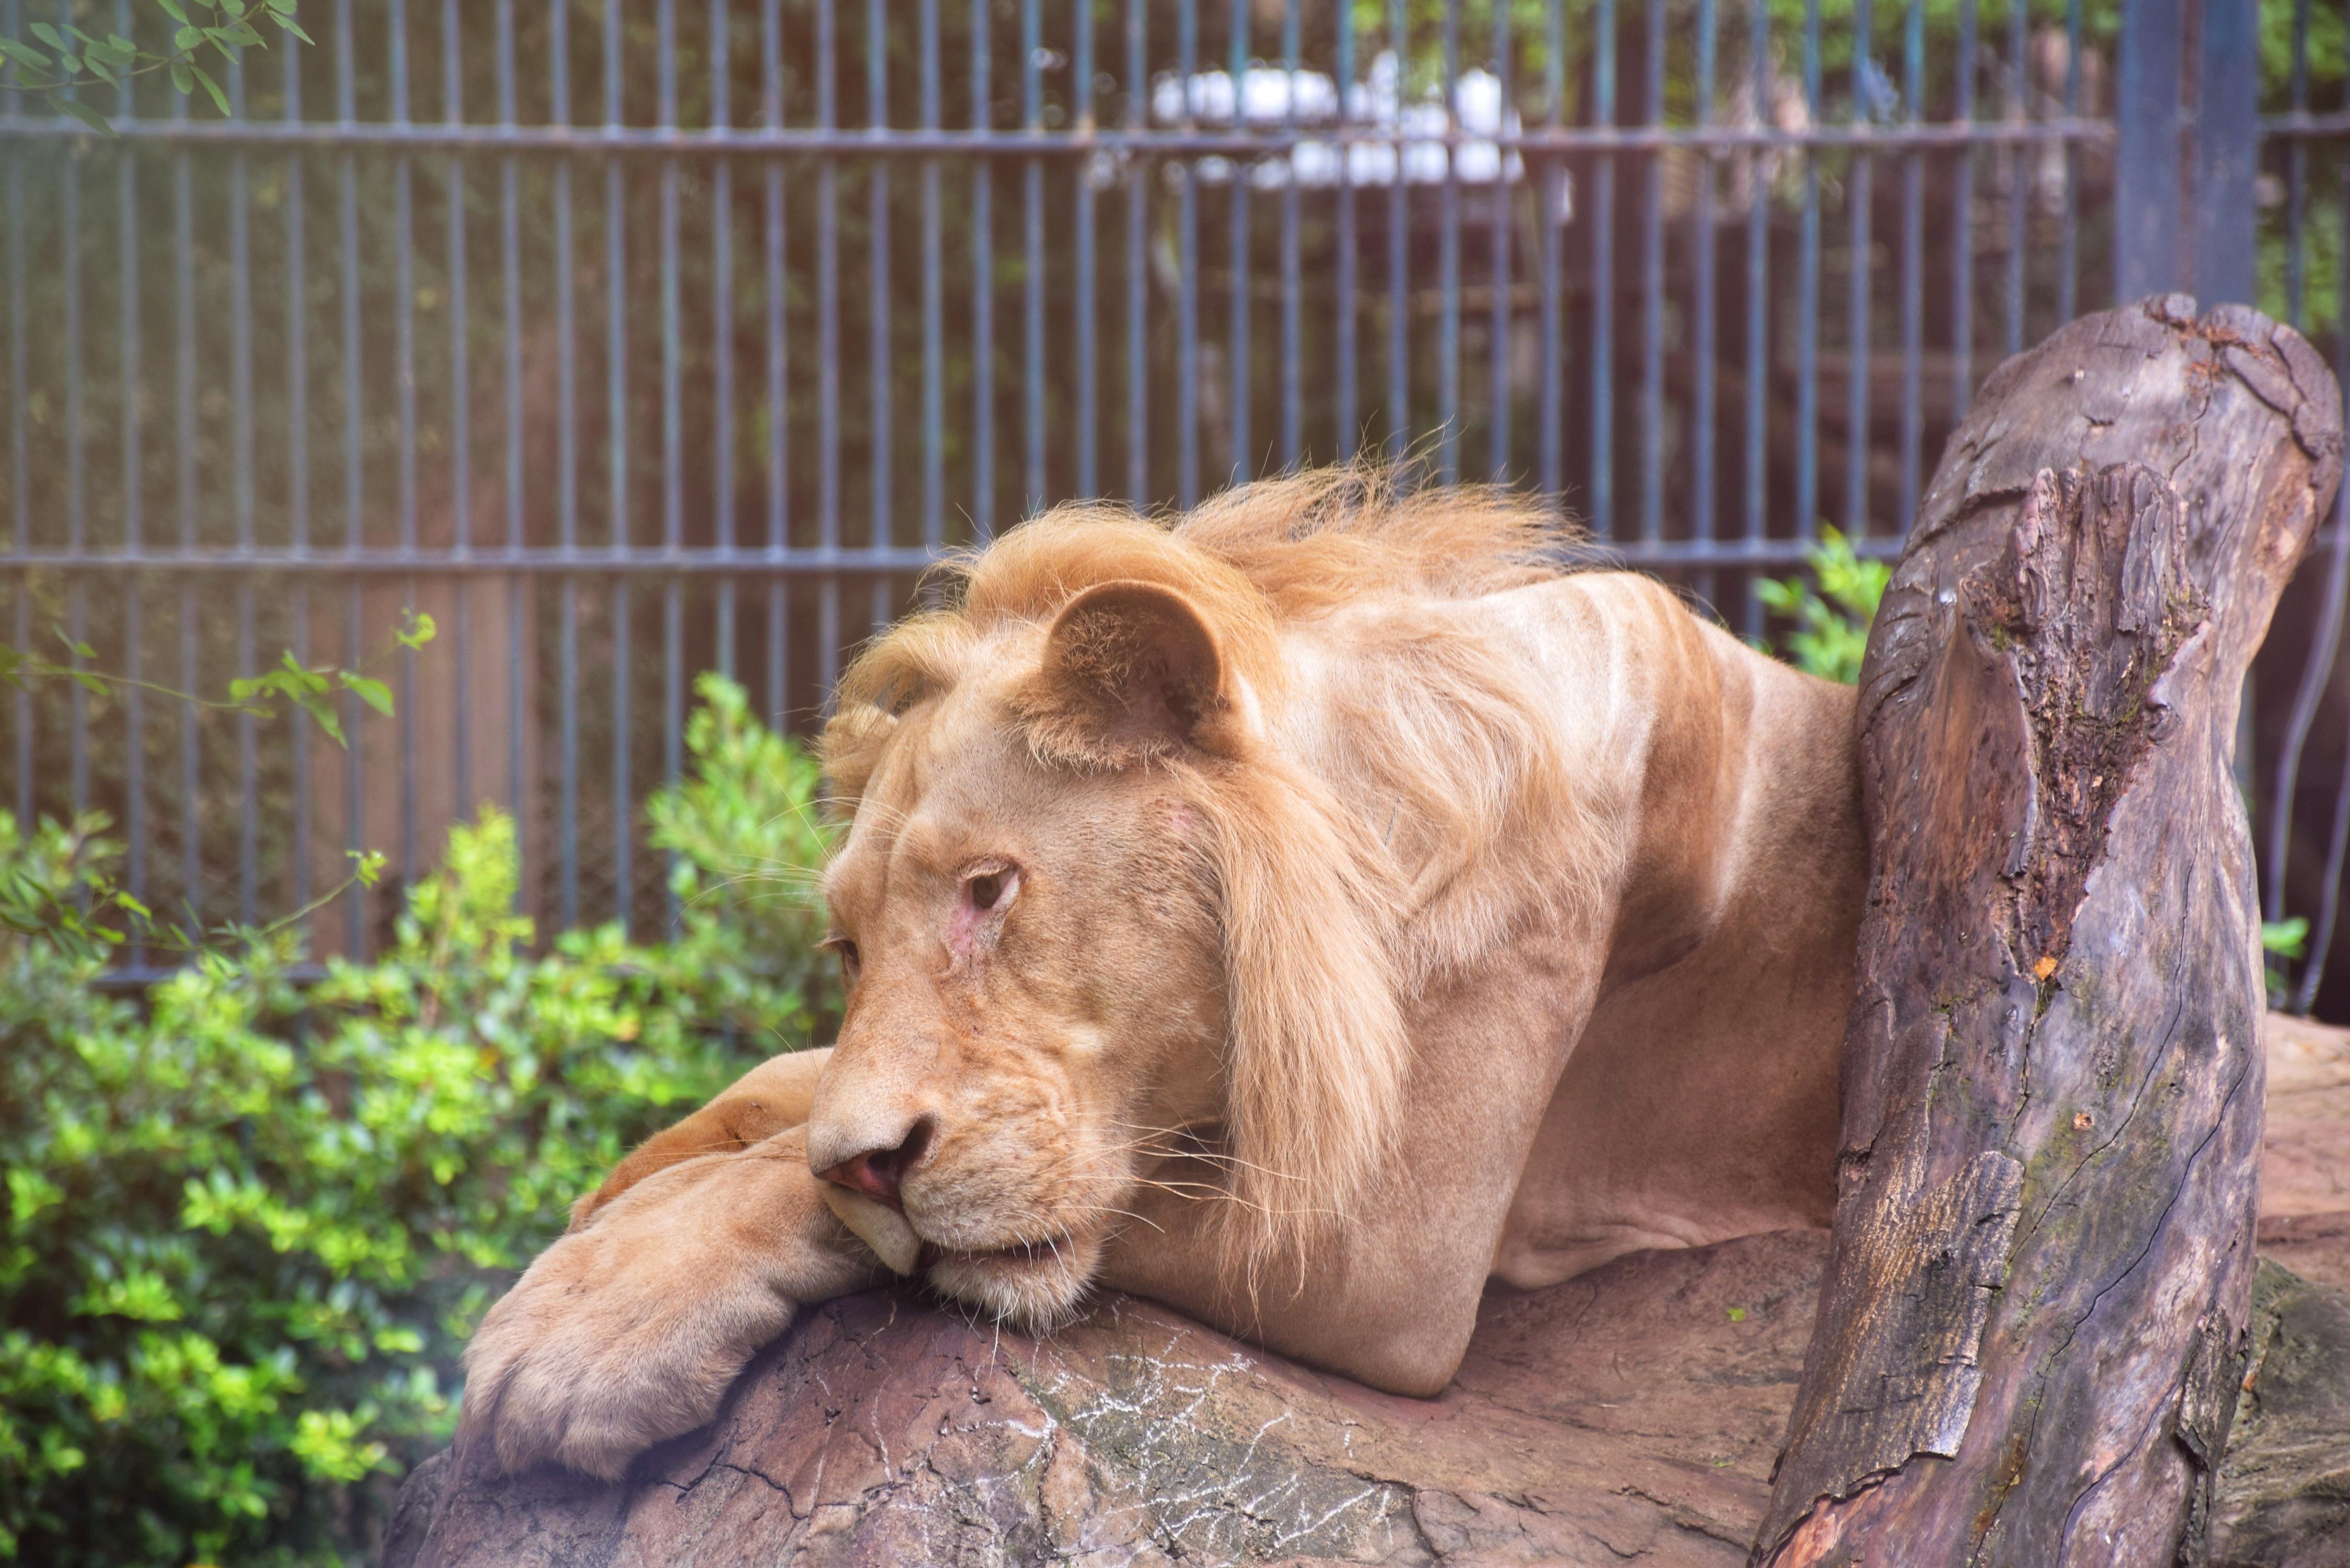 Sudan: Löwen im Zoo droht der Hungertod